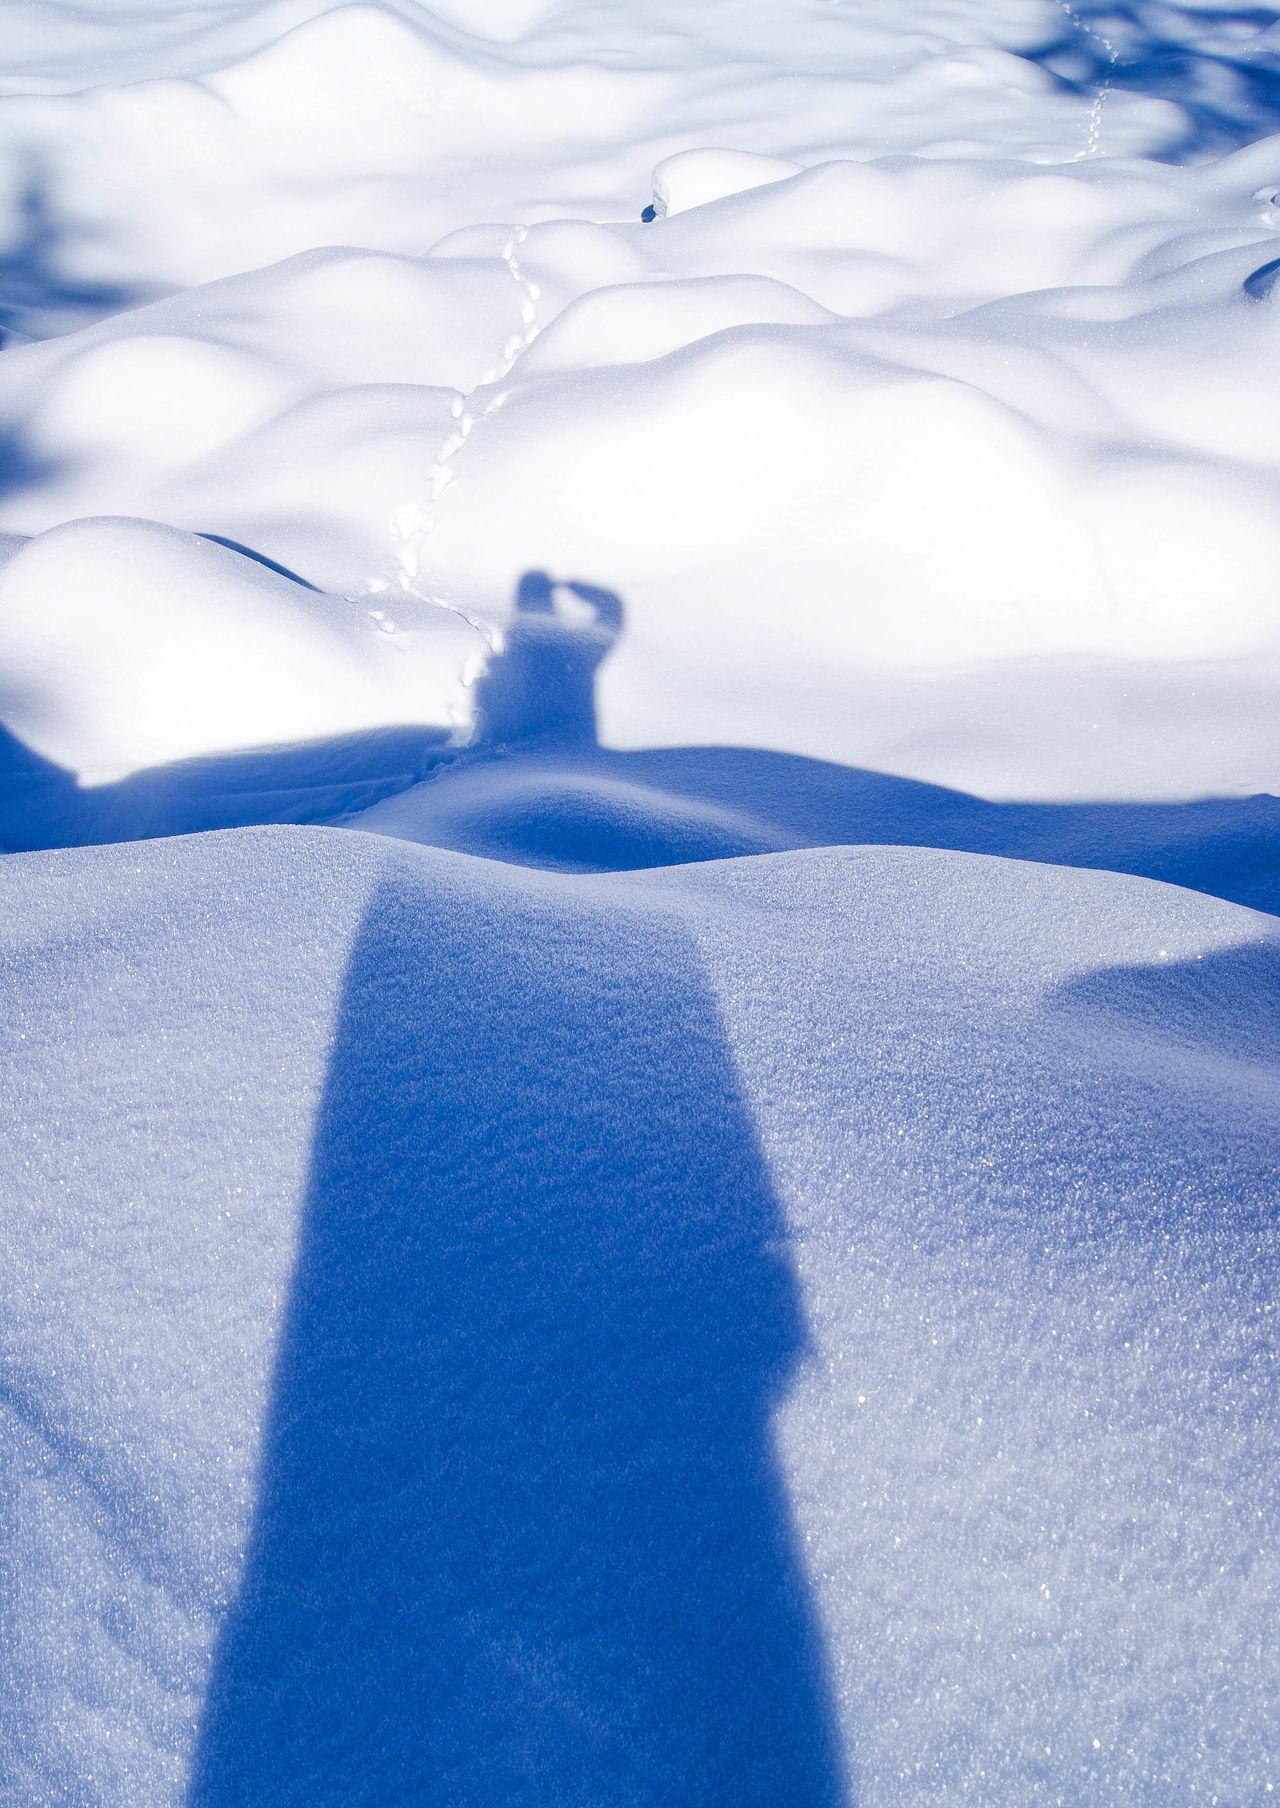 Beautiful stock photos of grafiken, shadow, landscape, leisure activity, tranquility